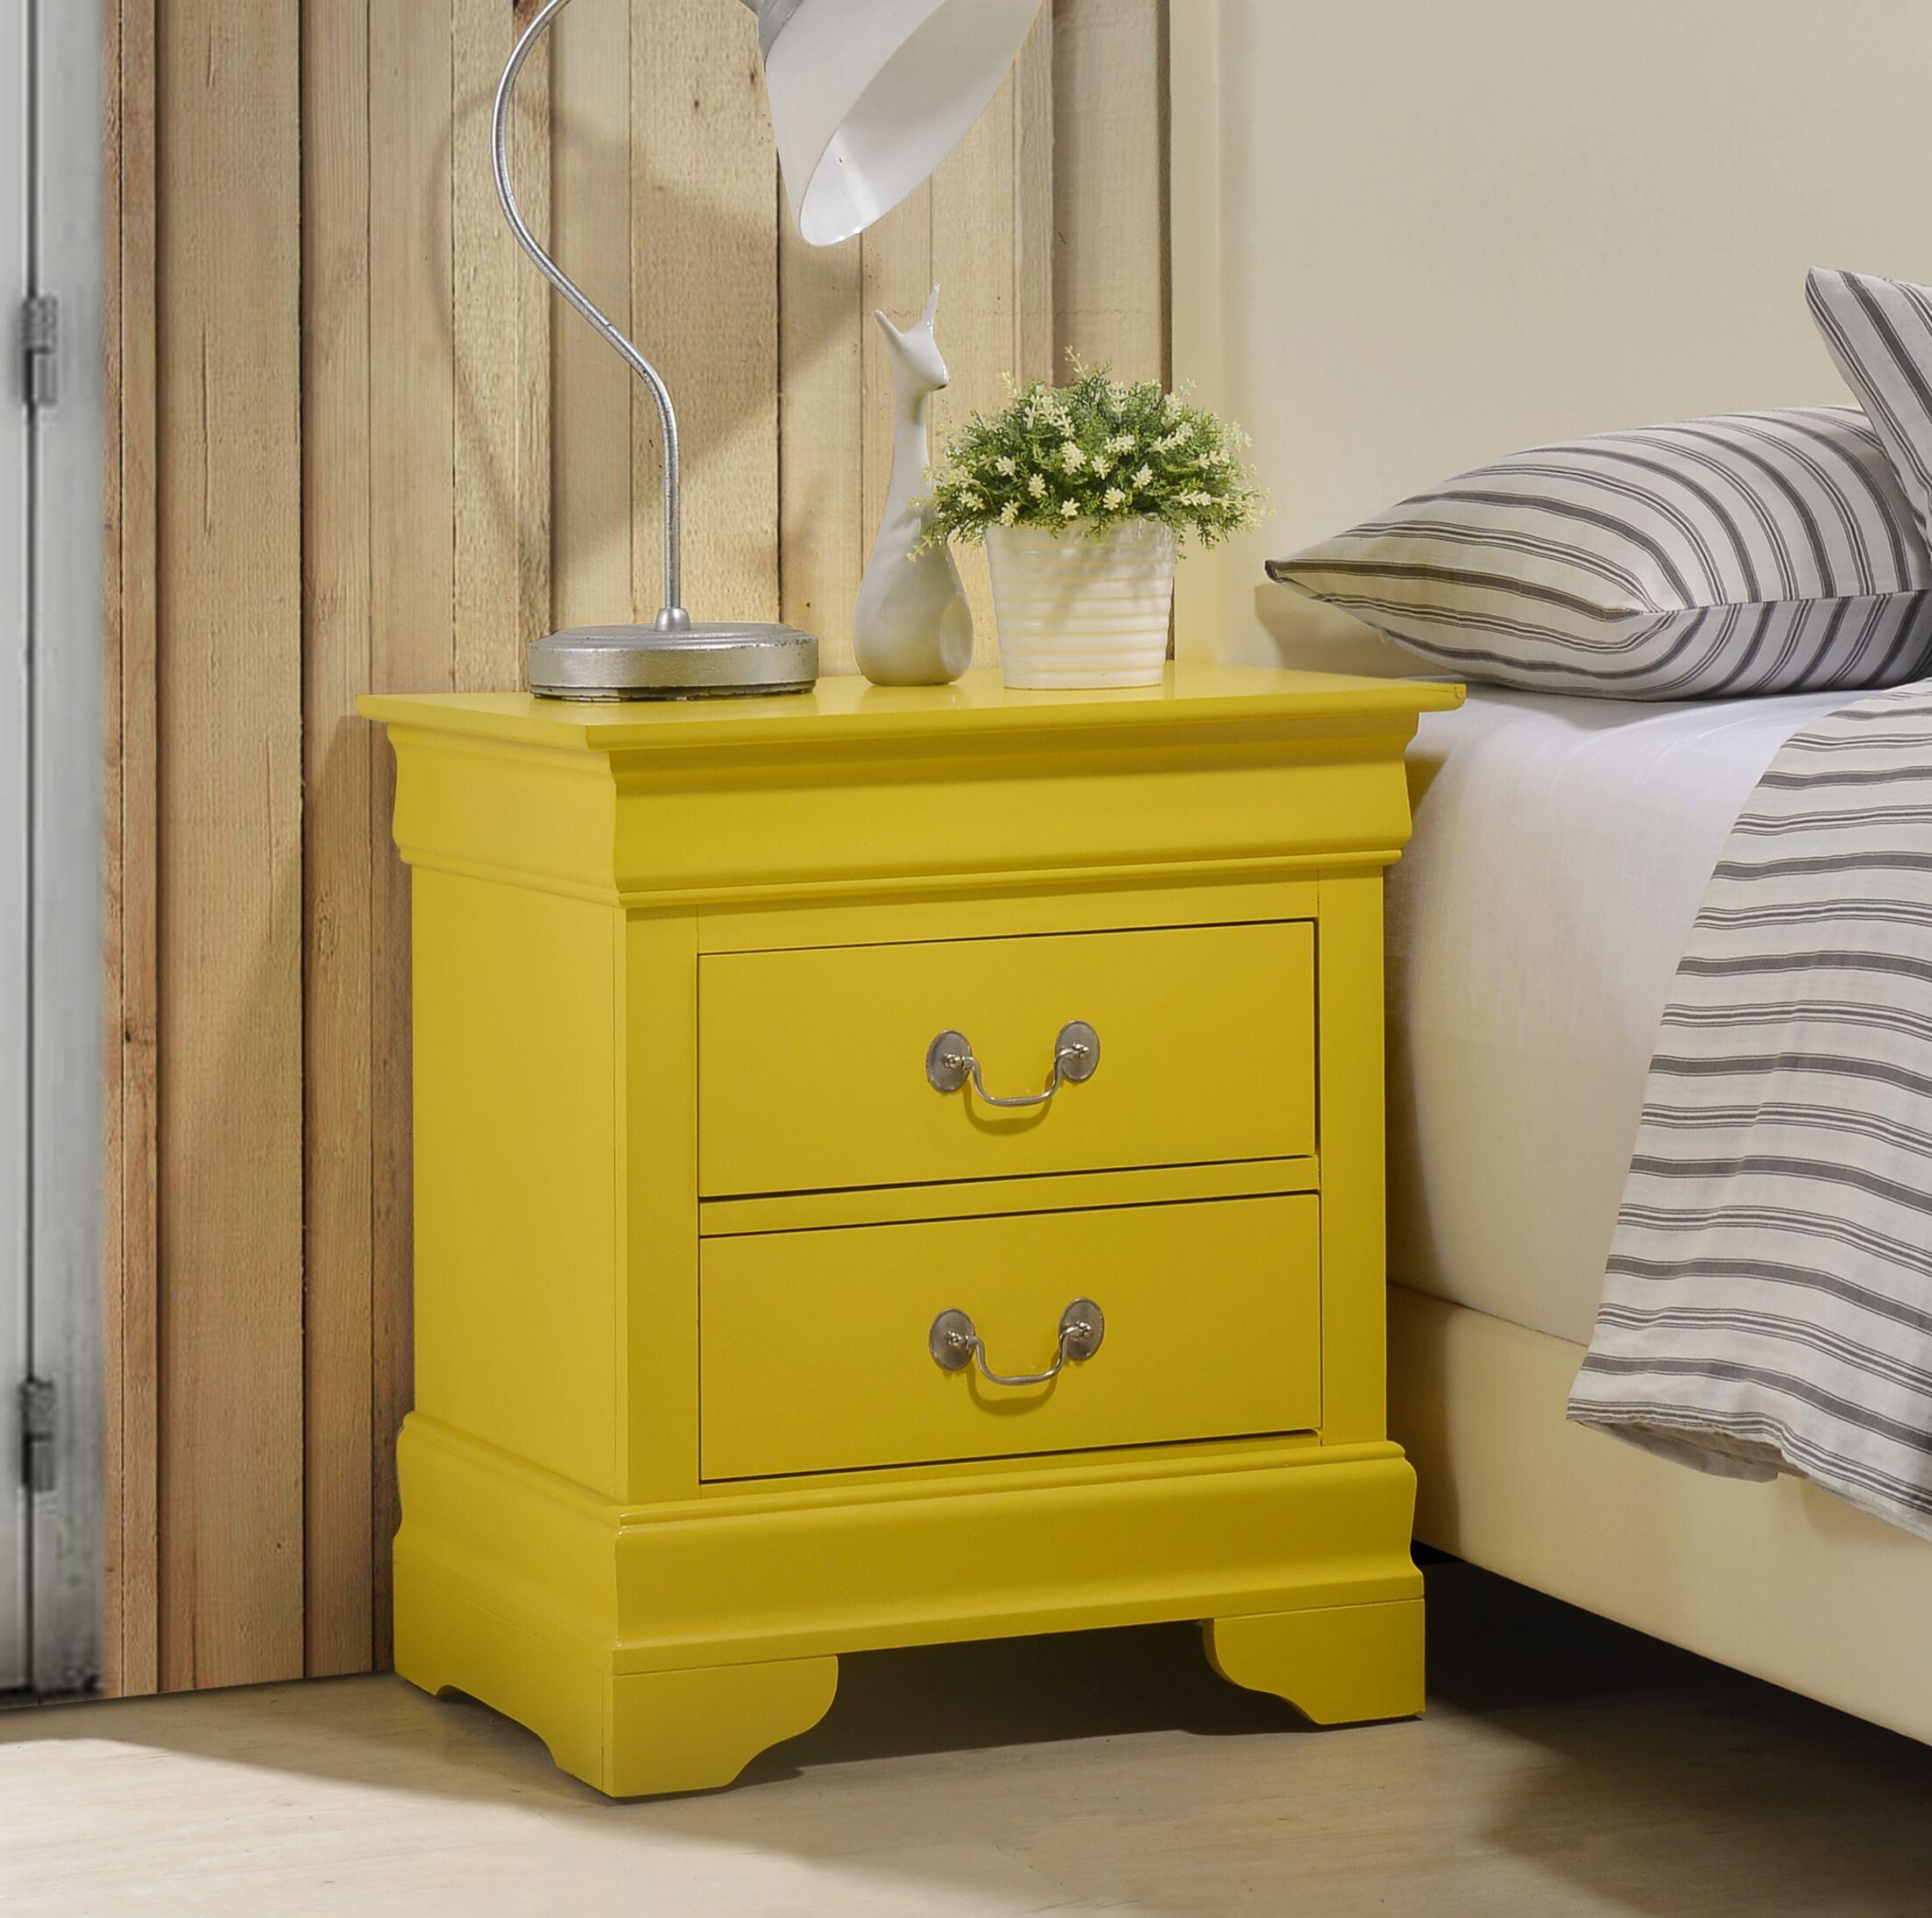 Lisle 2 Drawer Nightstand Color: Yellow